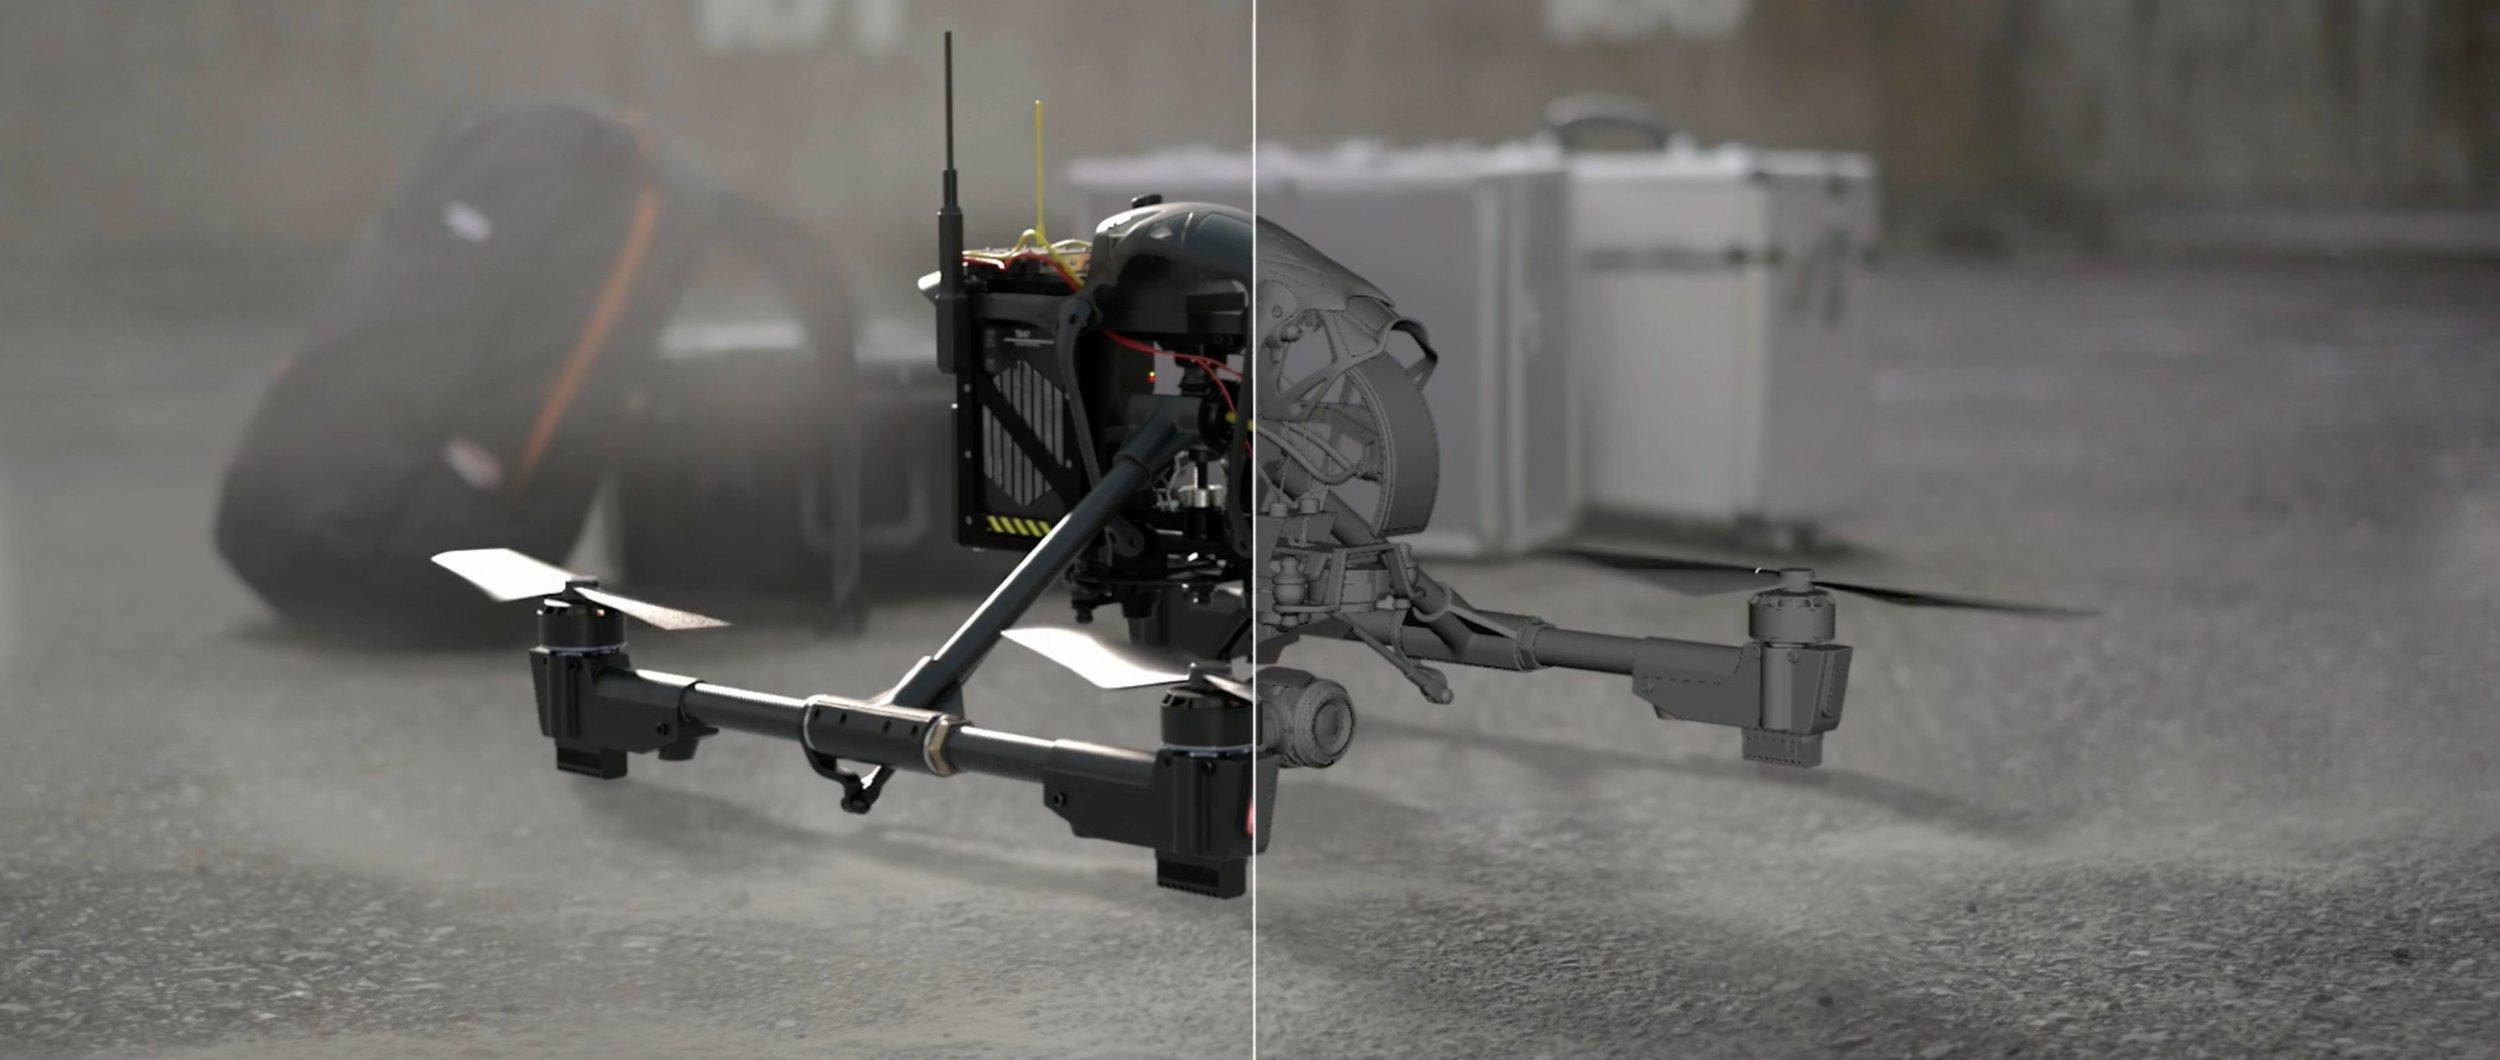 Nissan Drones - 02.jpeg